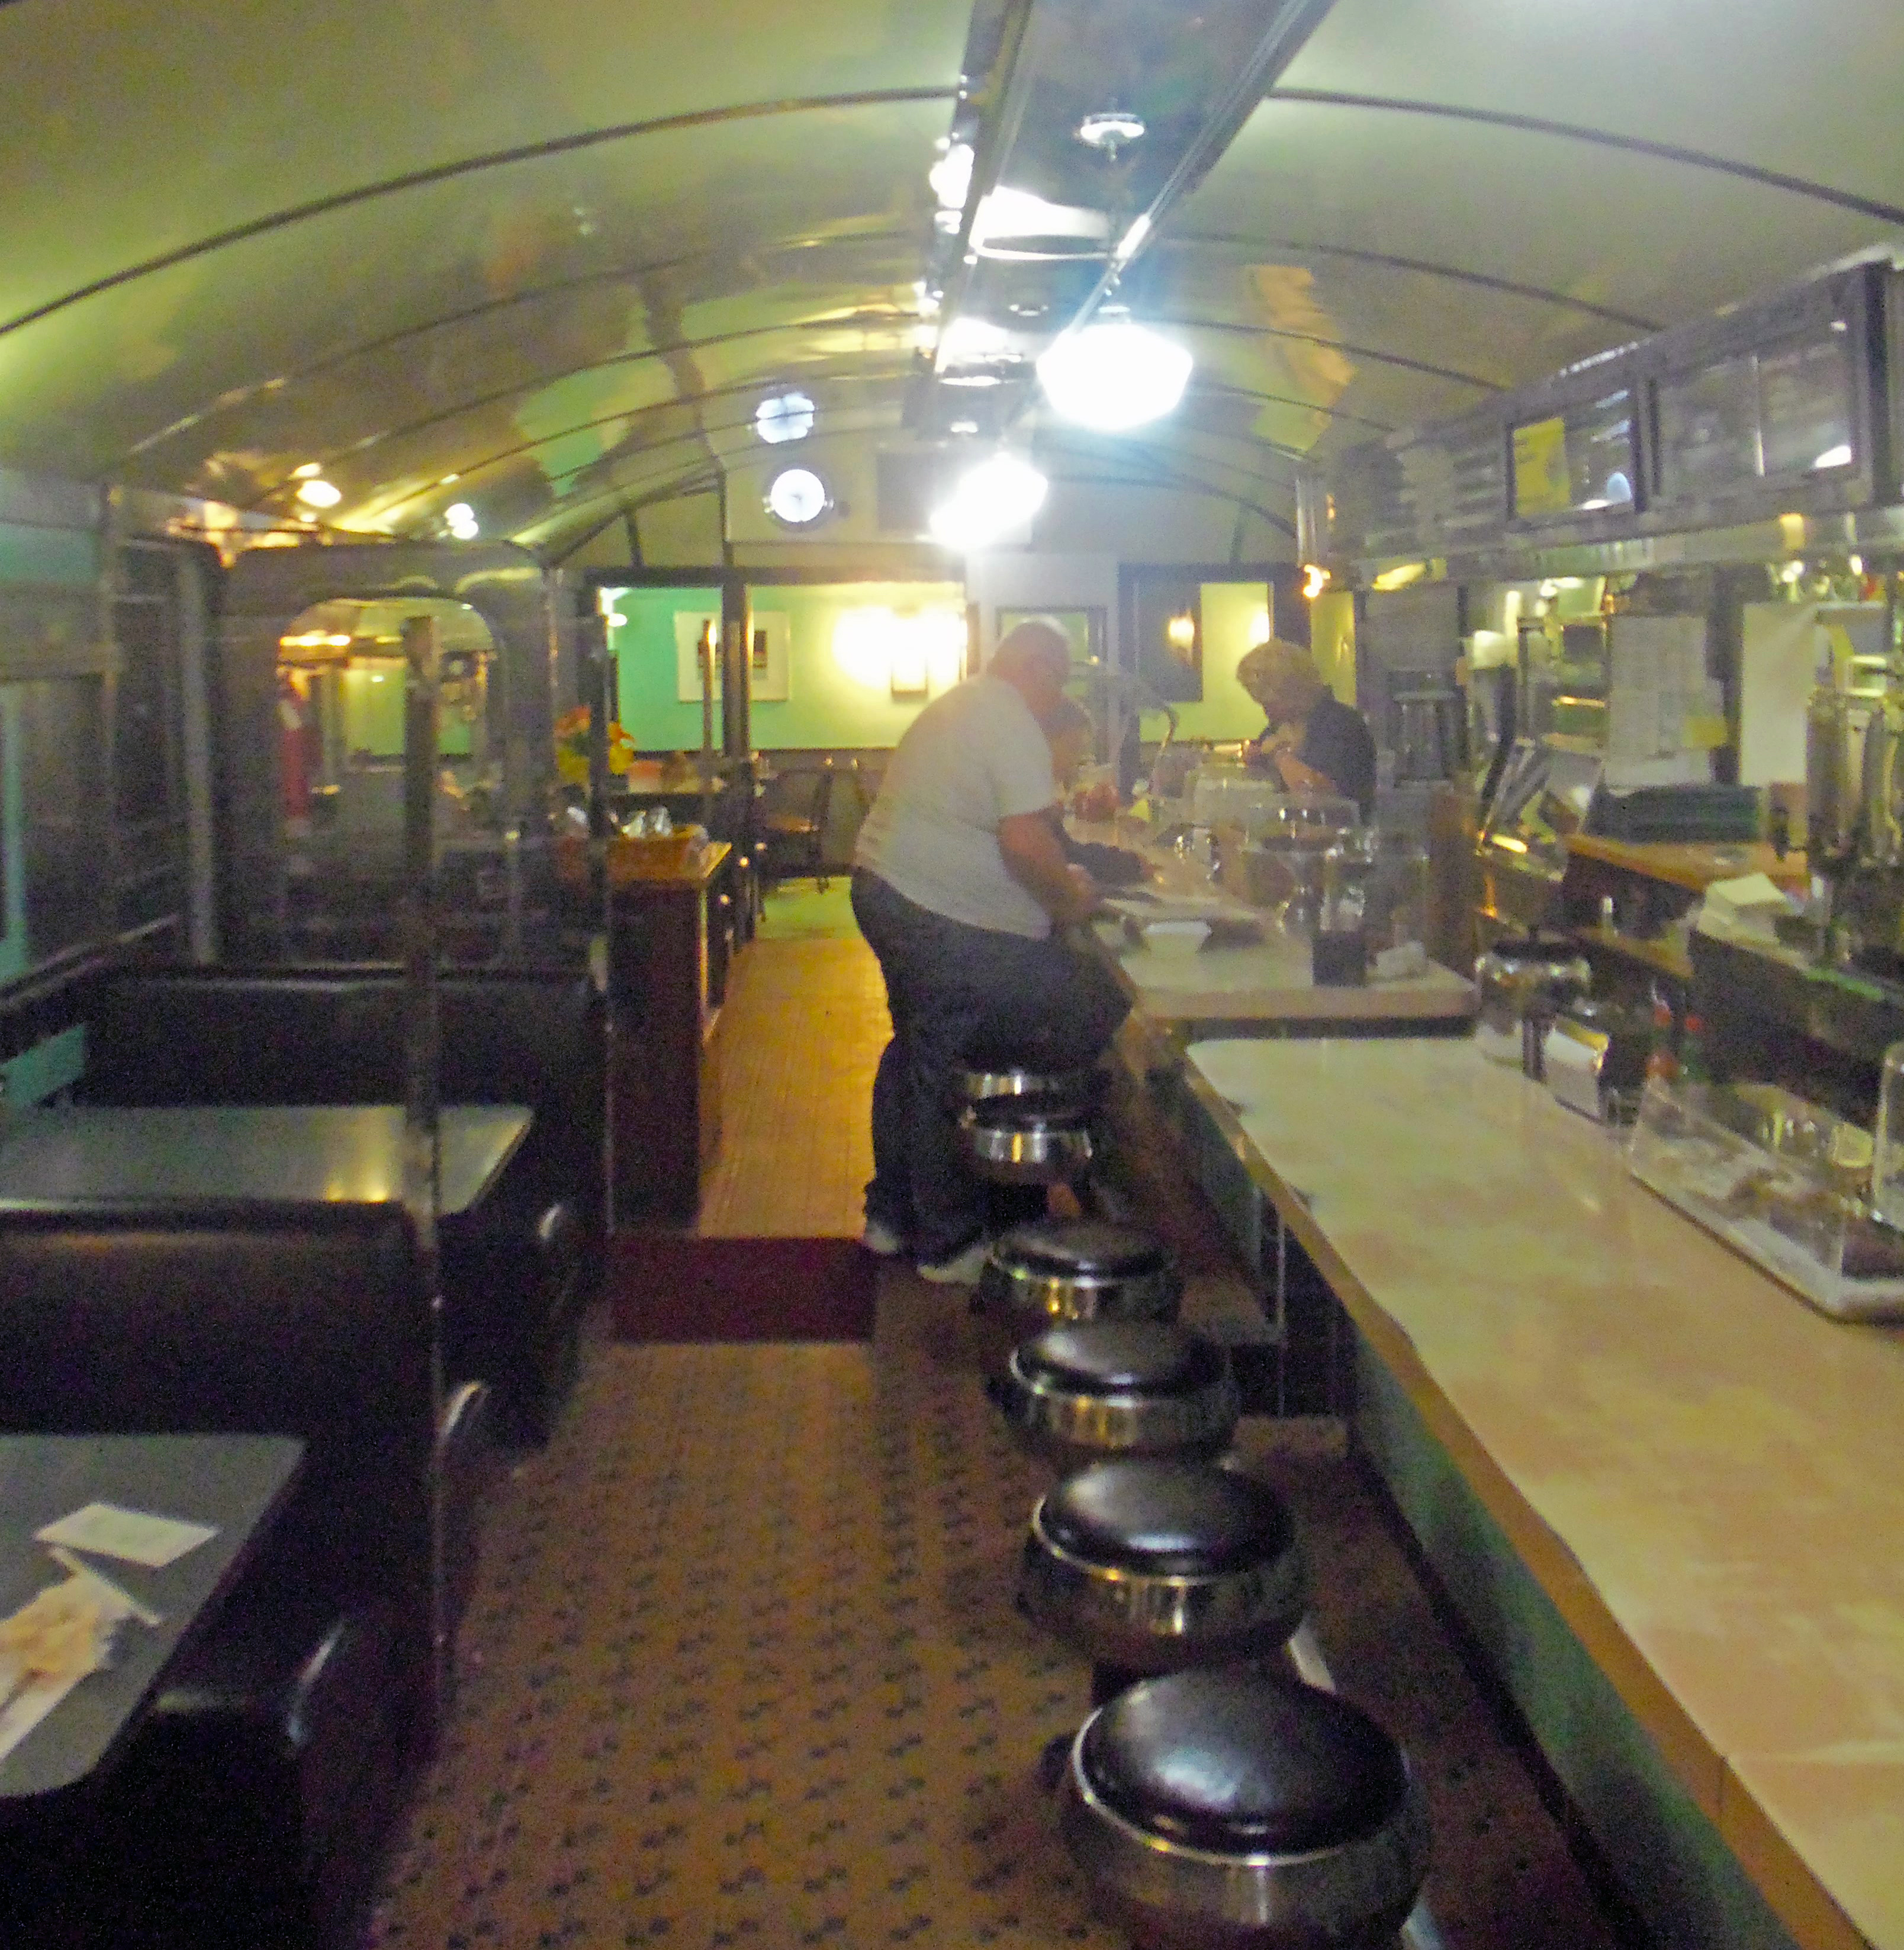 Image gallery diner interior 1920 for Diner interior